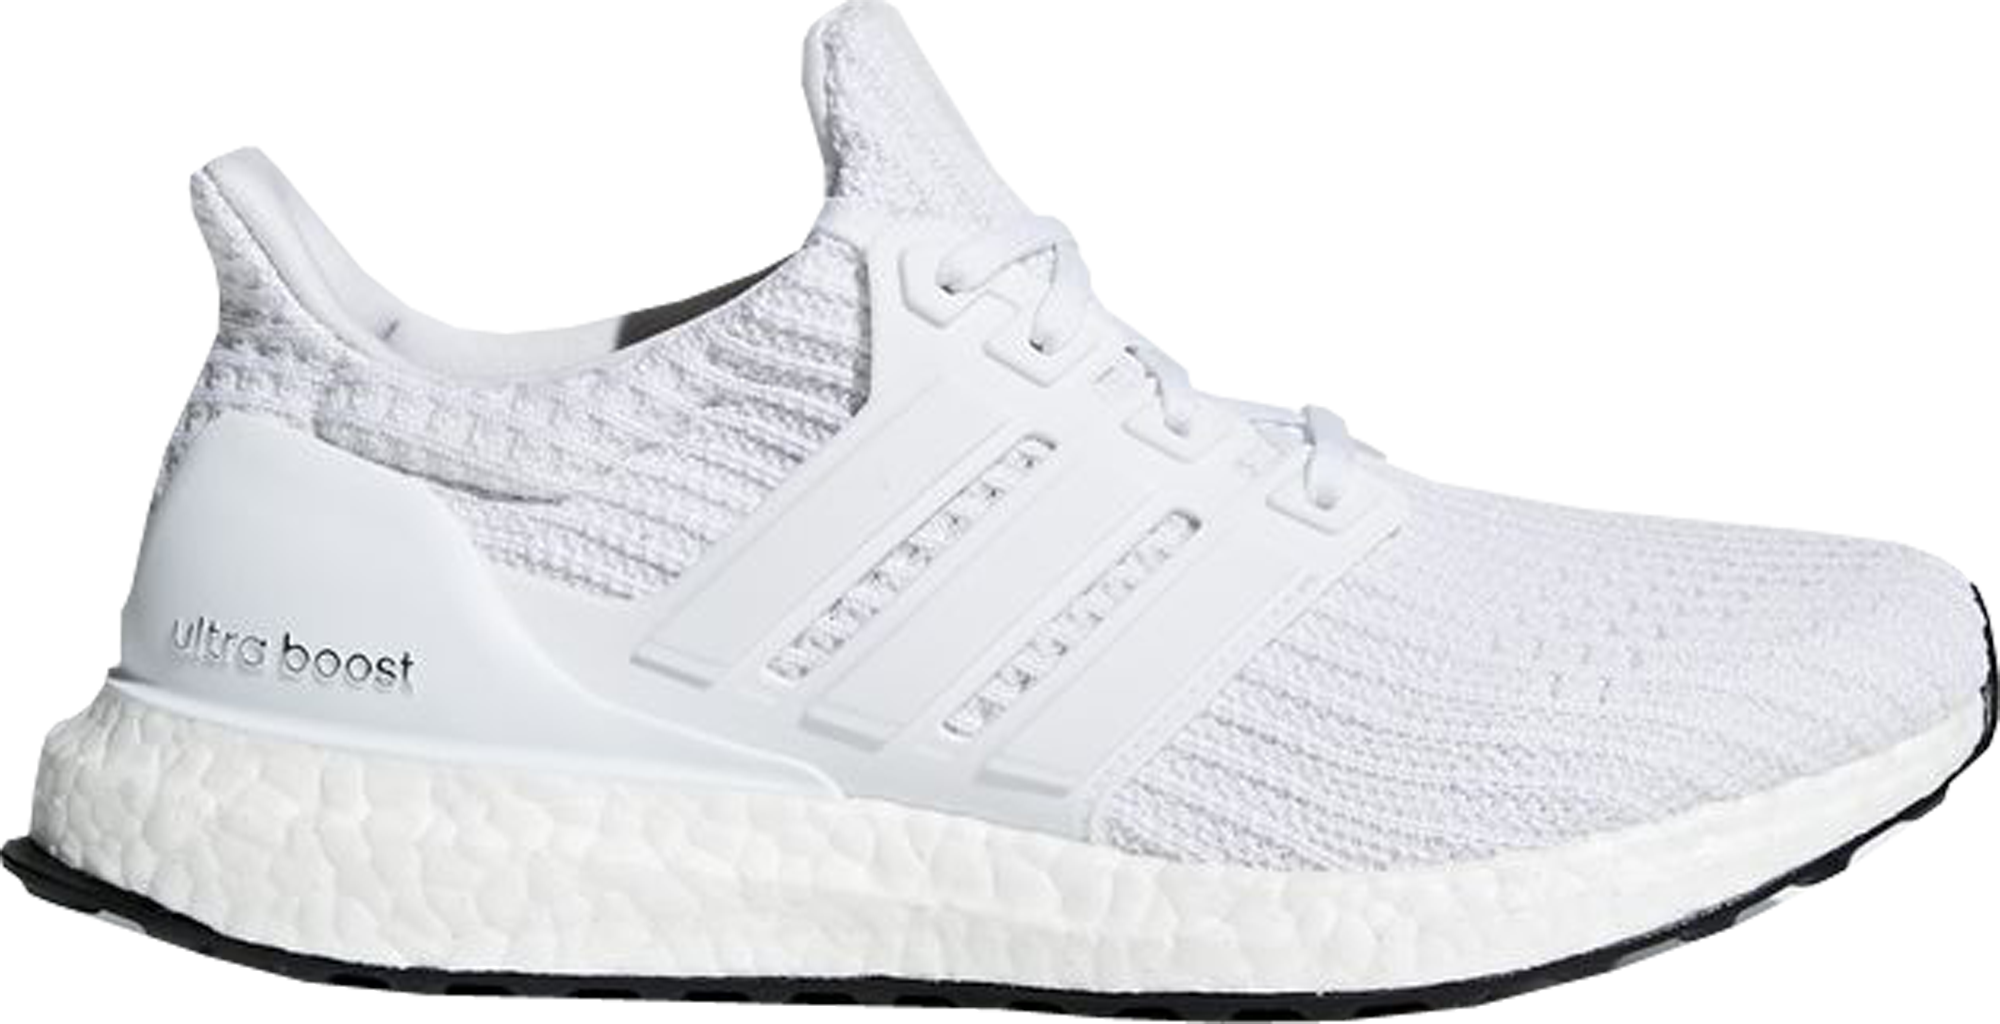 adidas Ultra Boost 4.0 Triple White (W)